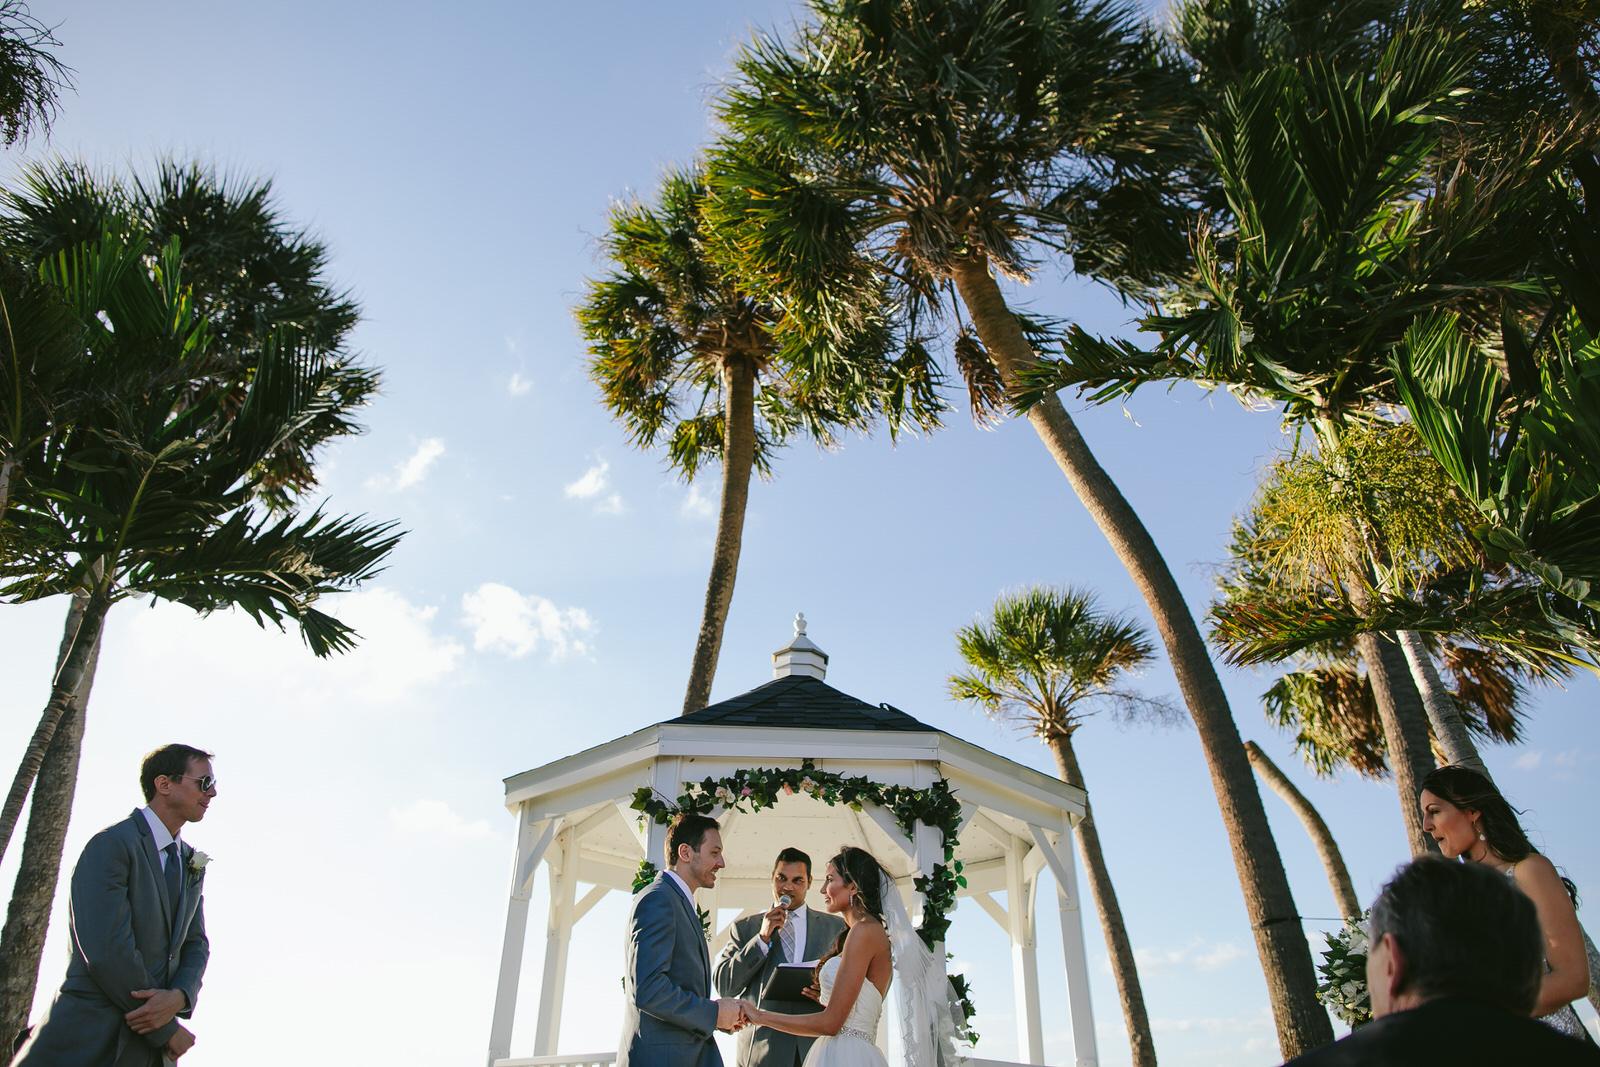 jensen_beach_wedding_ceremony-129.jpg